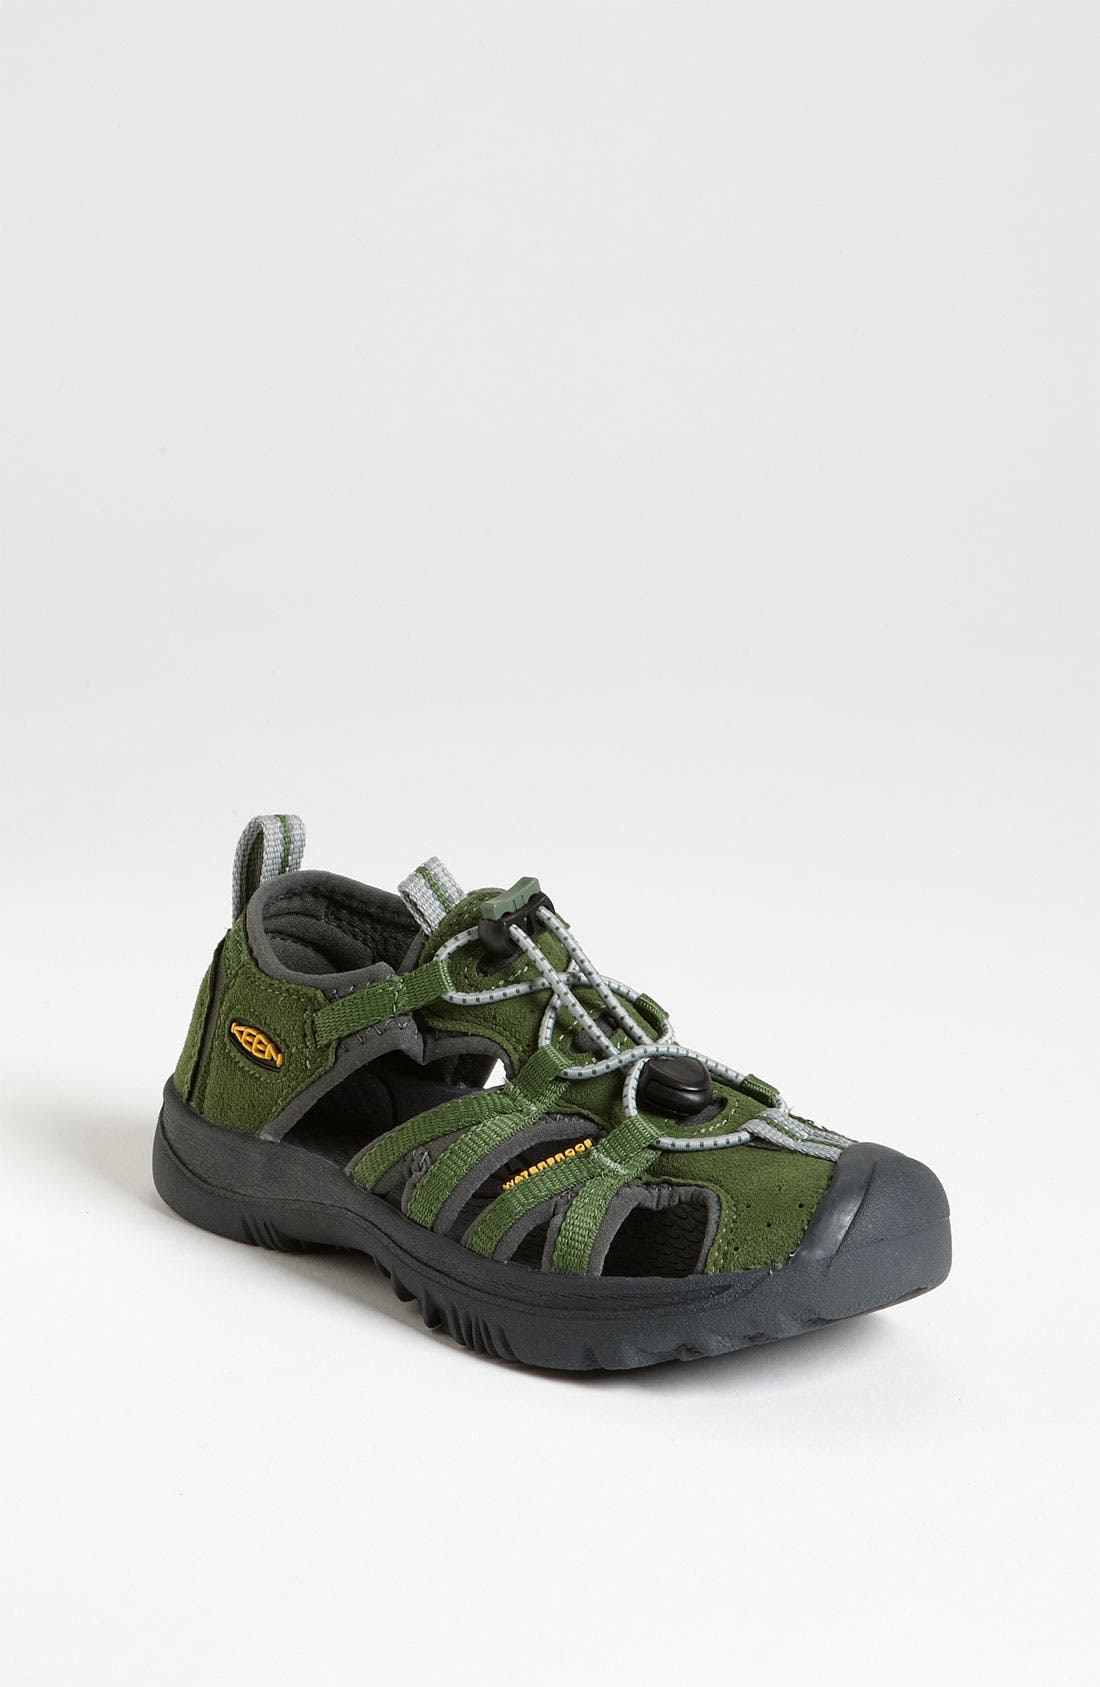 Alternate Image 1 Selected - Keen 'Kanyon' Sandal (Toddler, Little Kid & Big Kid)